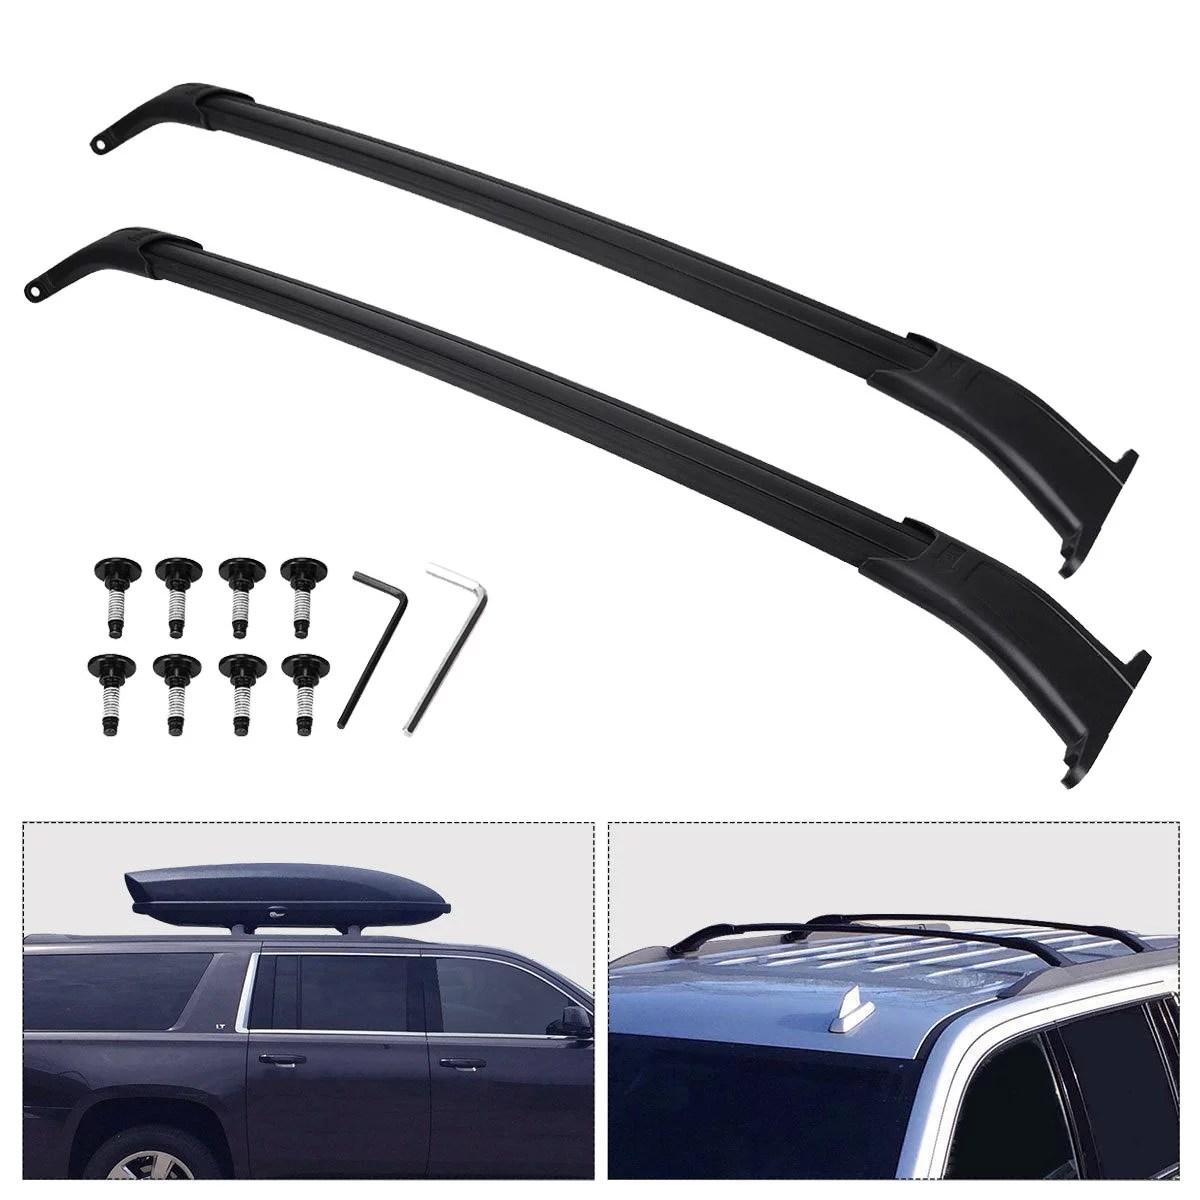 black roof rack cross bars for 2015 2020 chevy suburban chevy tahoe gmc yukon yukon xl cadillac escalade cadillac escalade esv